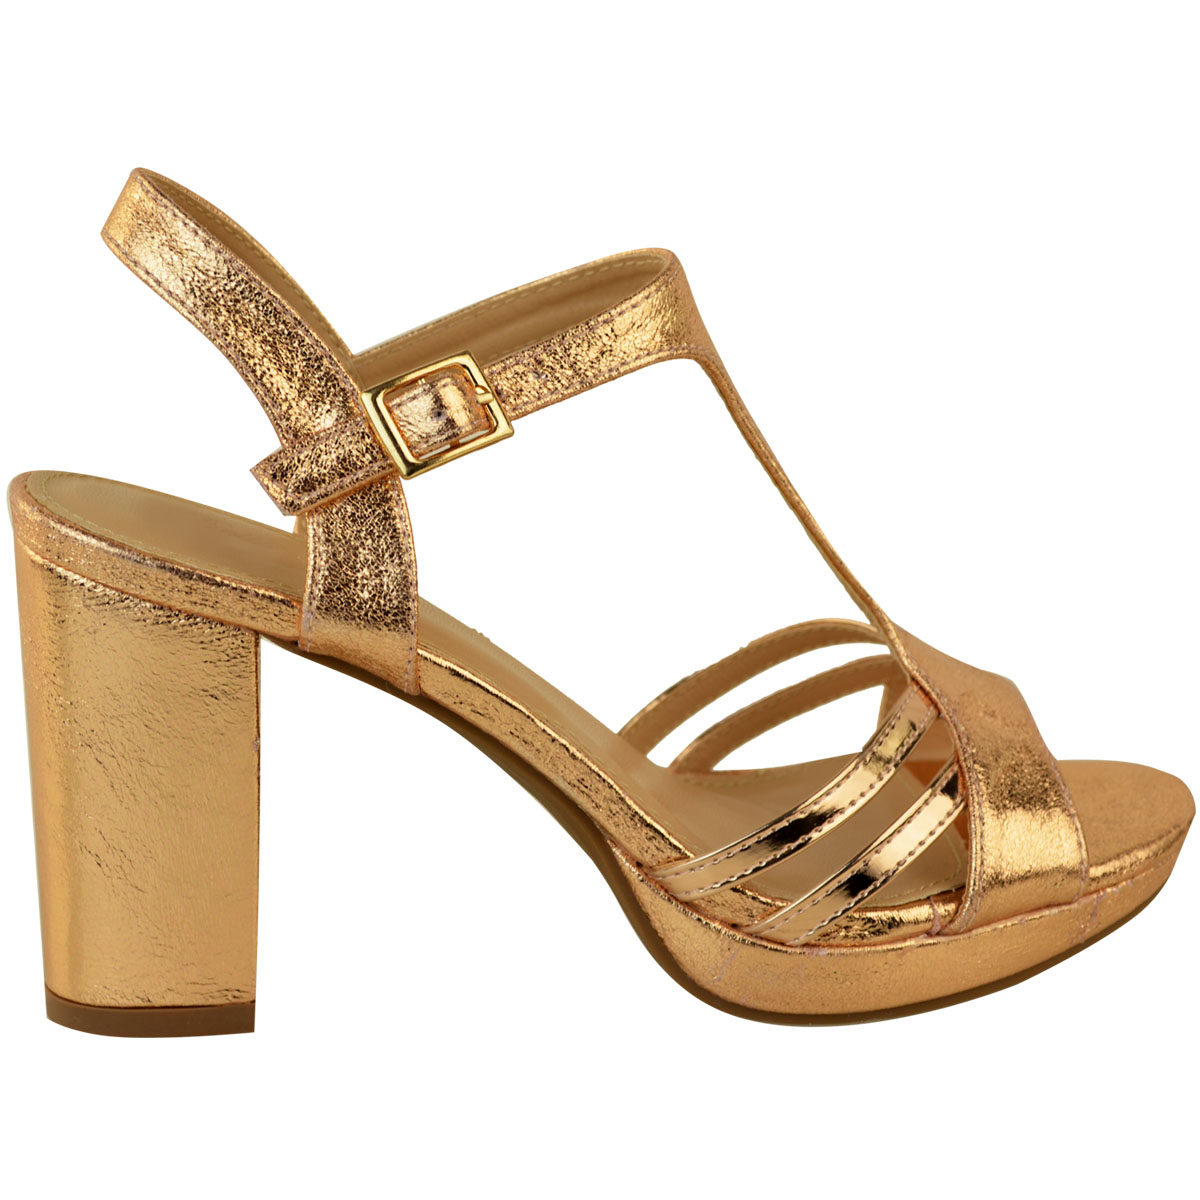 Sandals Mid Block Heel Womens Ladies Party Wedding Bridal Comfort Strappy Size